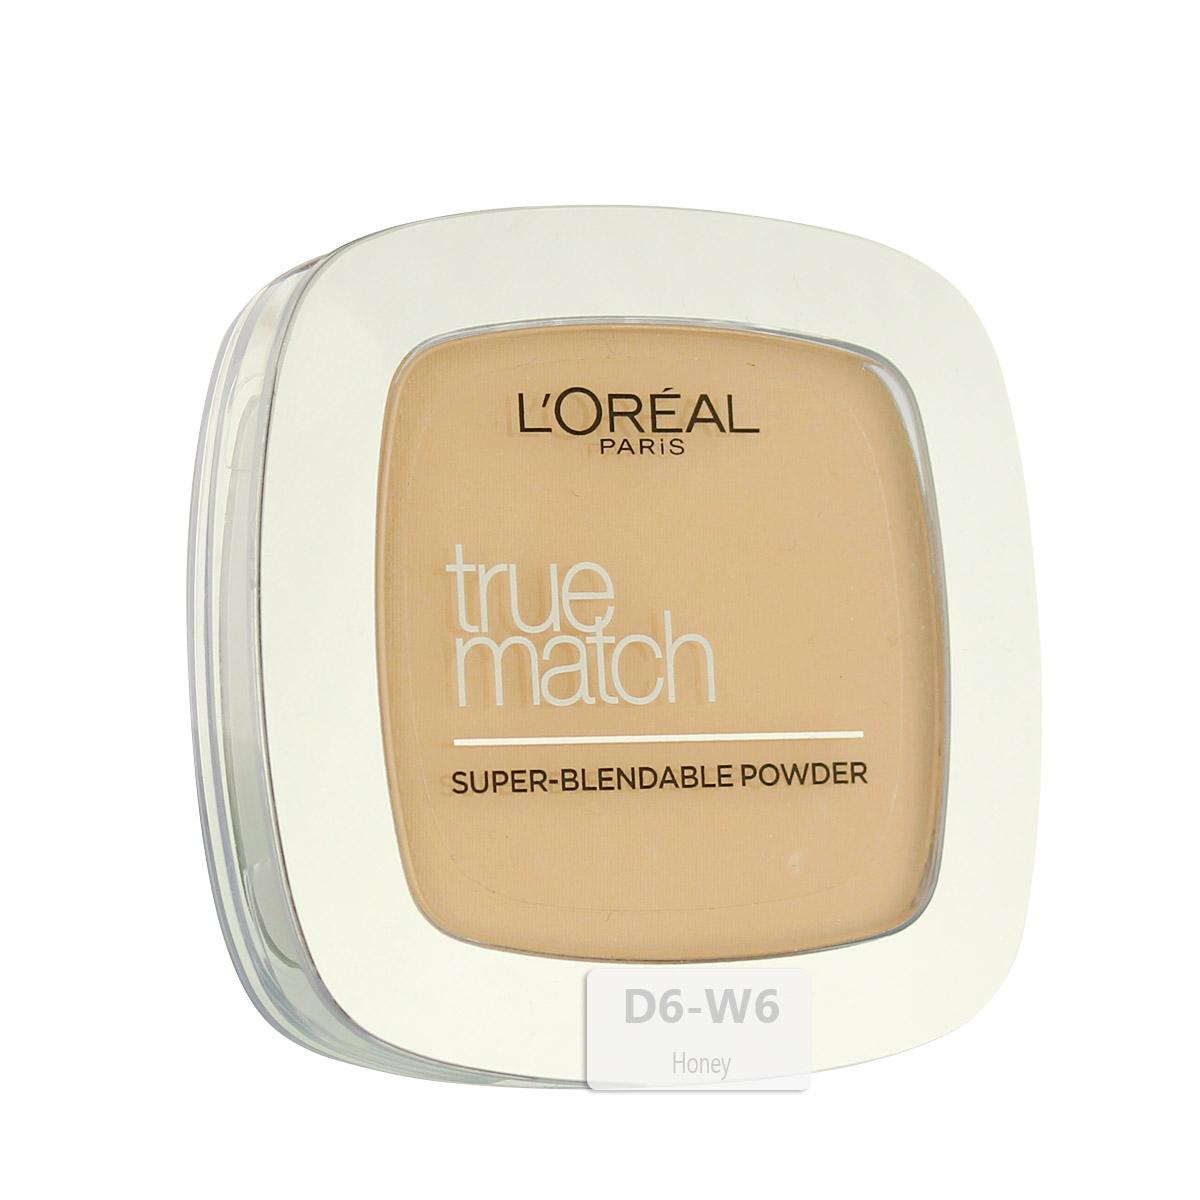 L´Oreal Paris True Match Super-Blendable Powder (D6/W6 Honey) 9 g